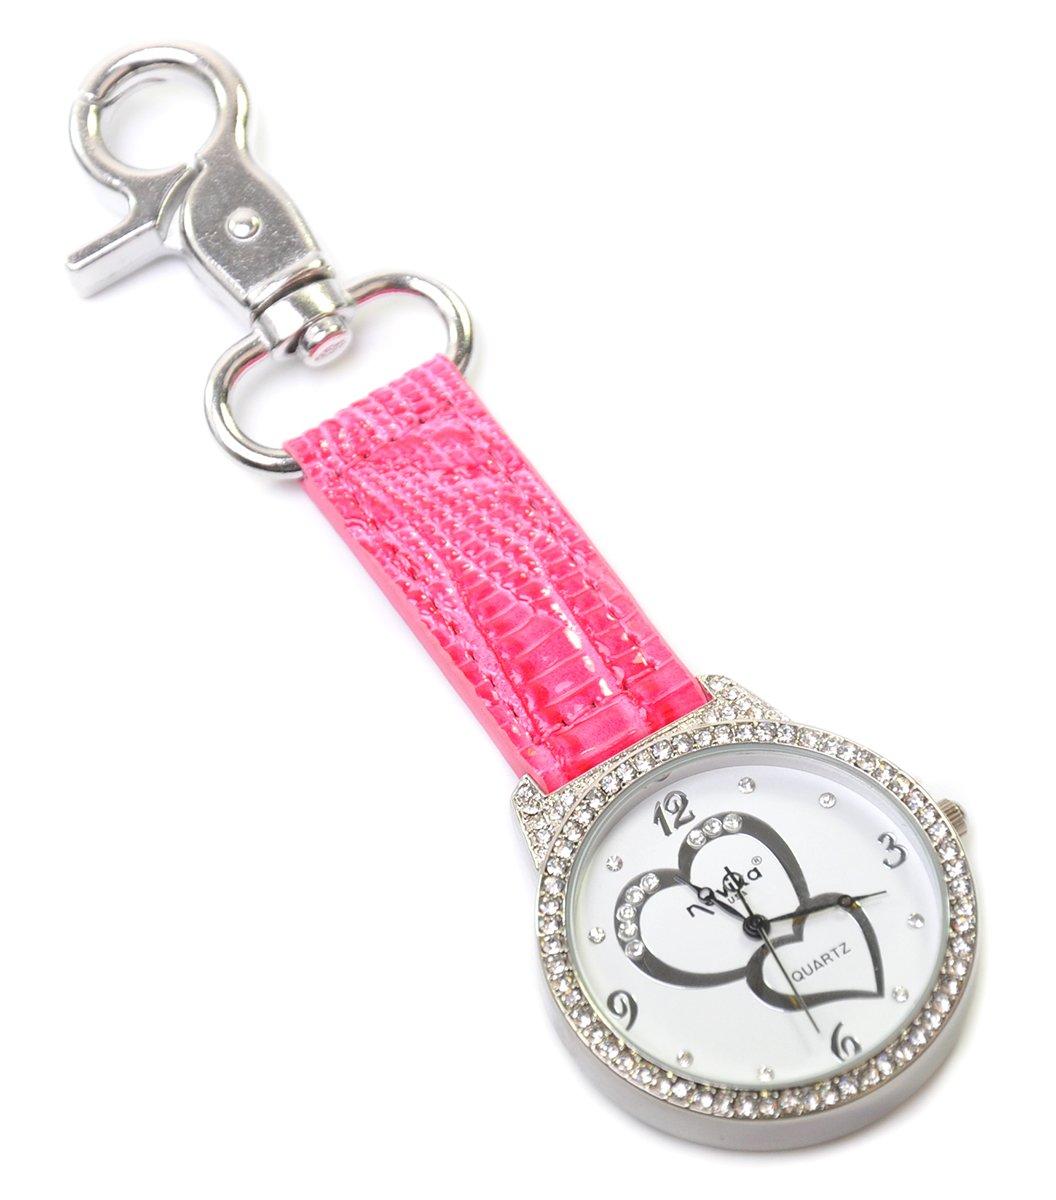 LPGA Women's Crystal Double Heart Bag Watch, Pink, 1 1/2 x 4 1/2